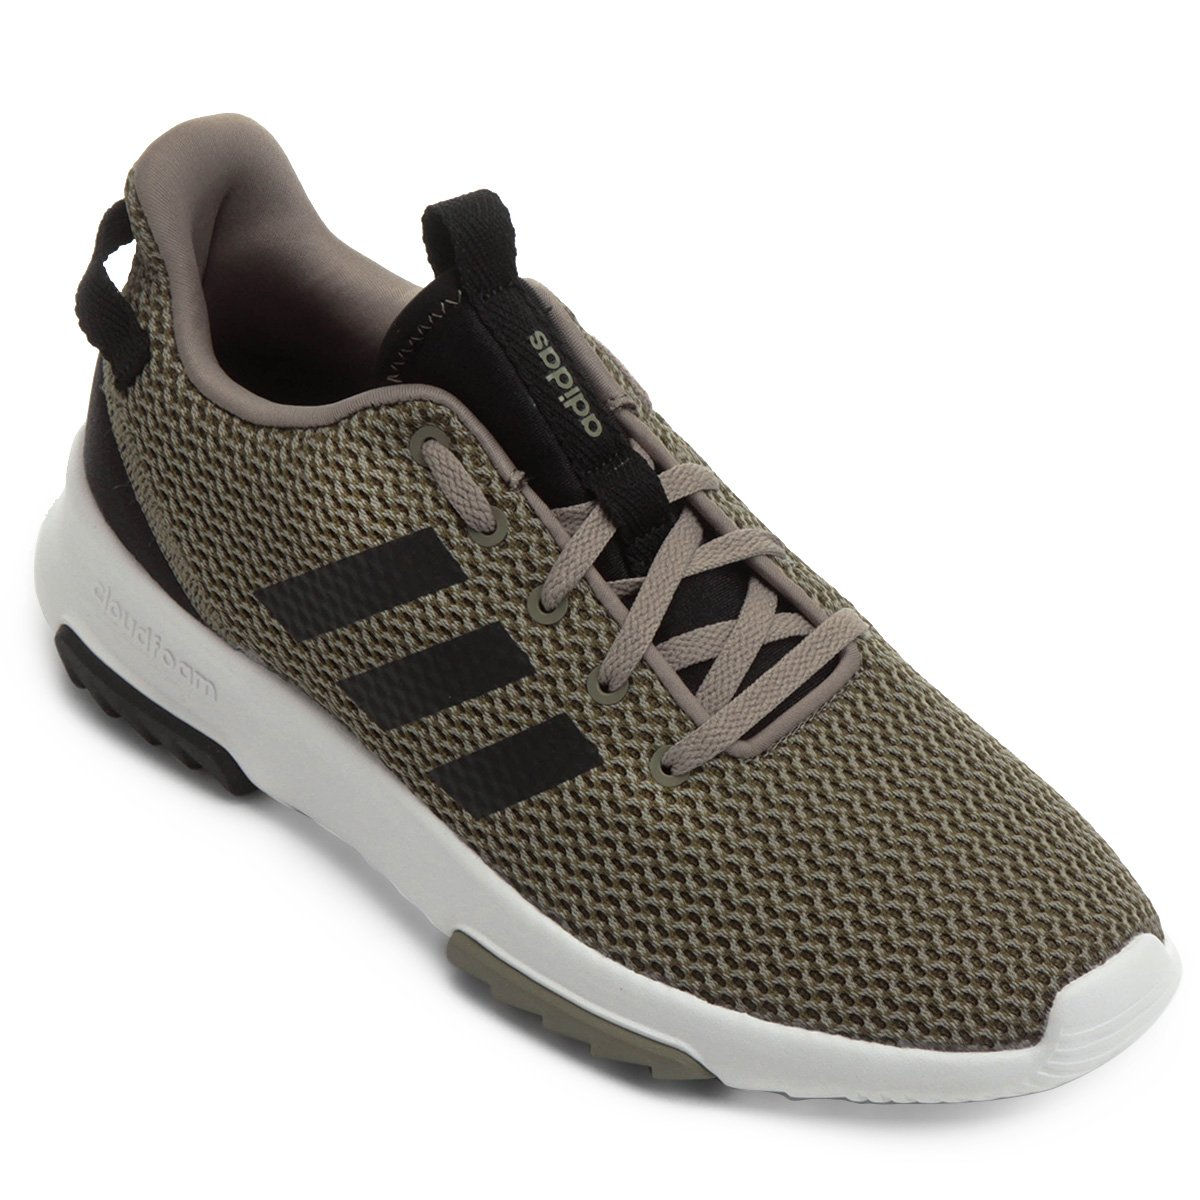 c16f979076c94 Tênis Adidas Cf Racer Tr Masculino - Verde Militar | Netshoes